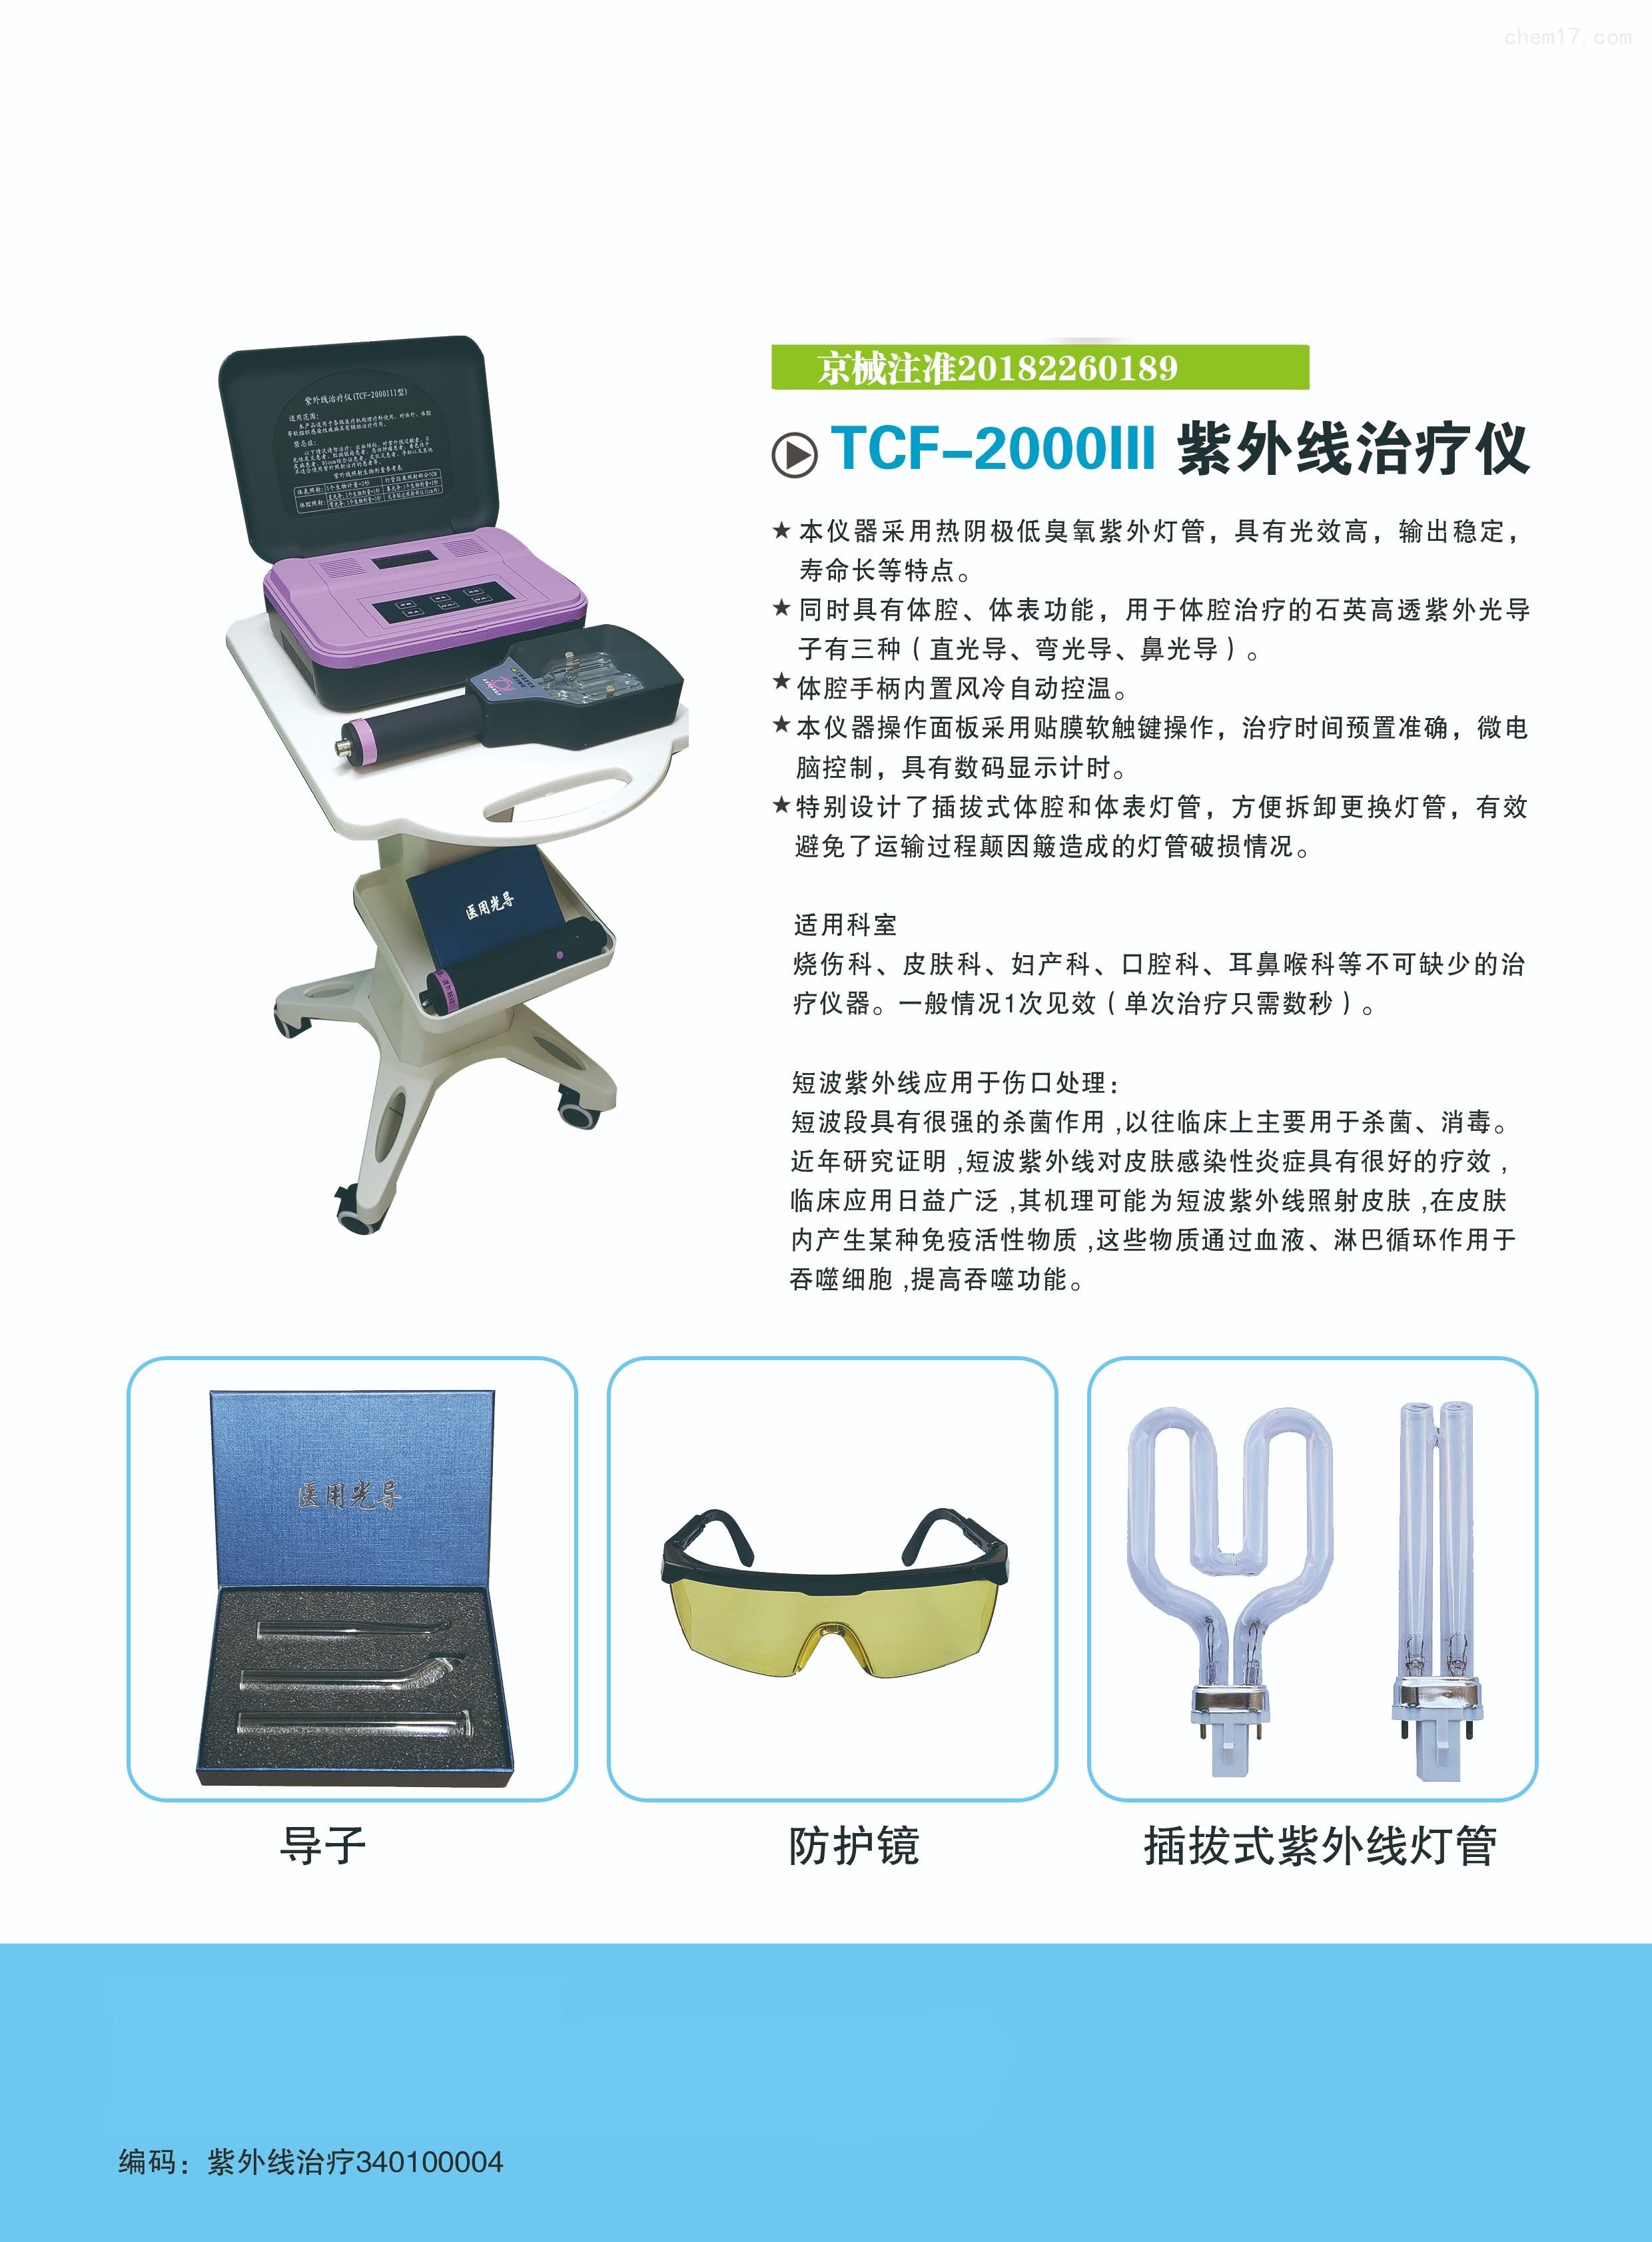 TXF-2000III型<strong>紫外线治疗仪</strong>.jpg